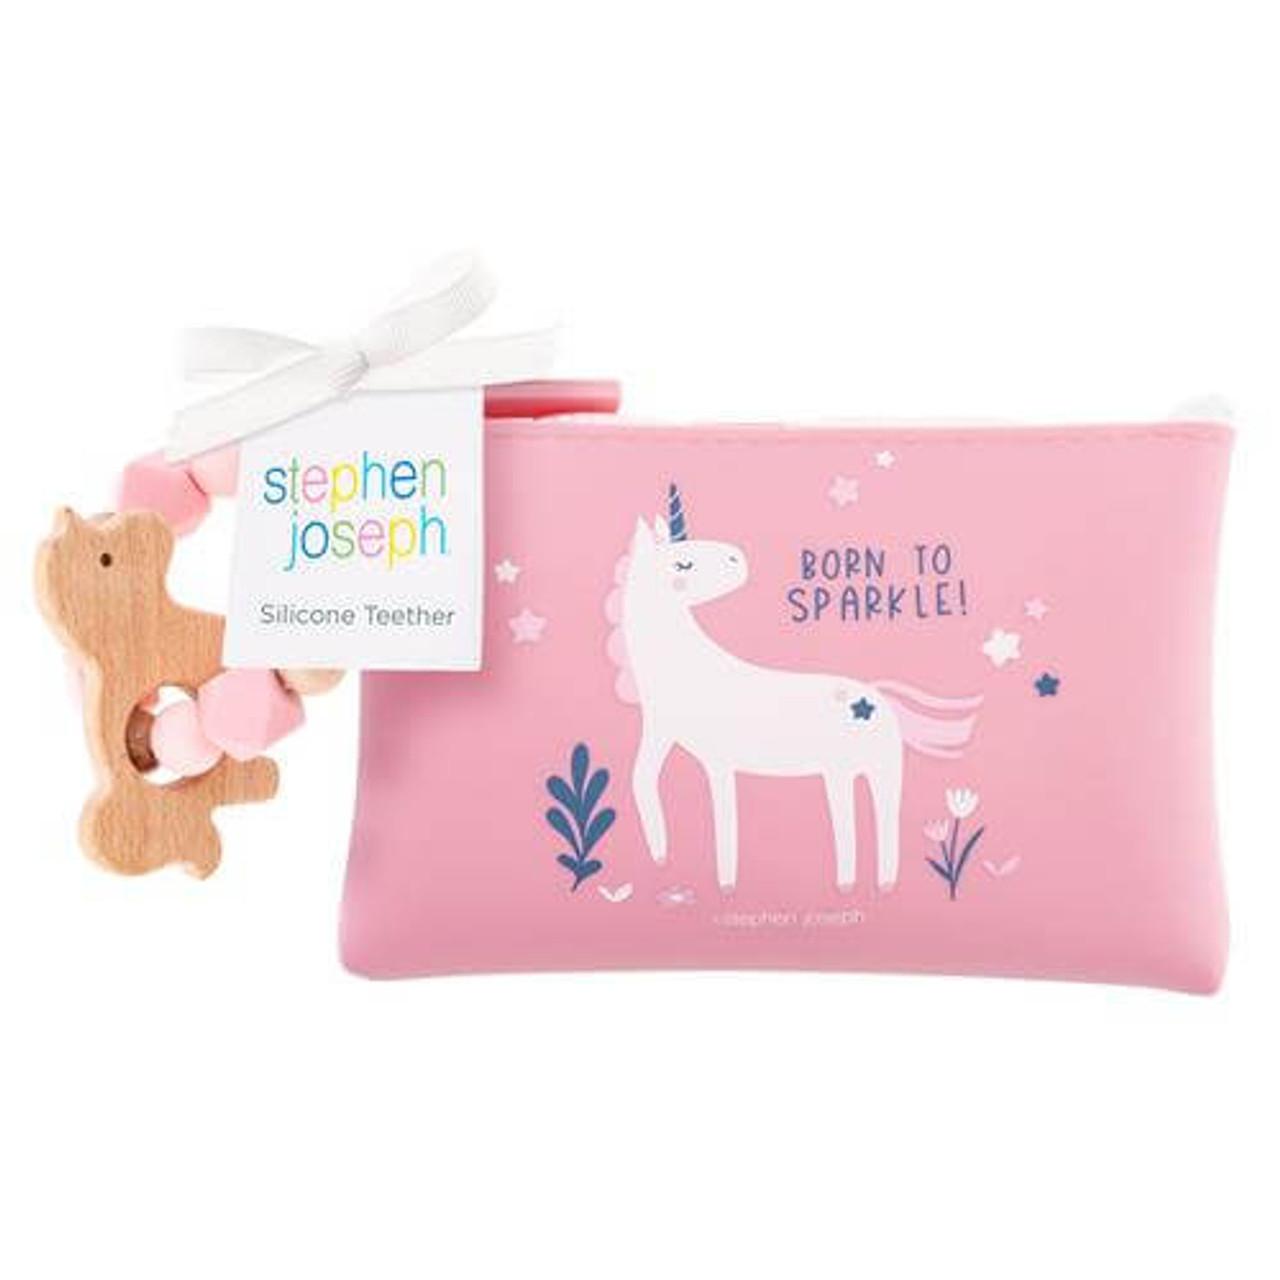 Stephen Joseph silicone wood unicorn teether pouch